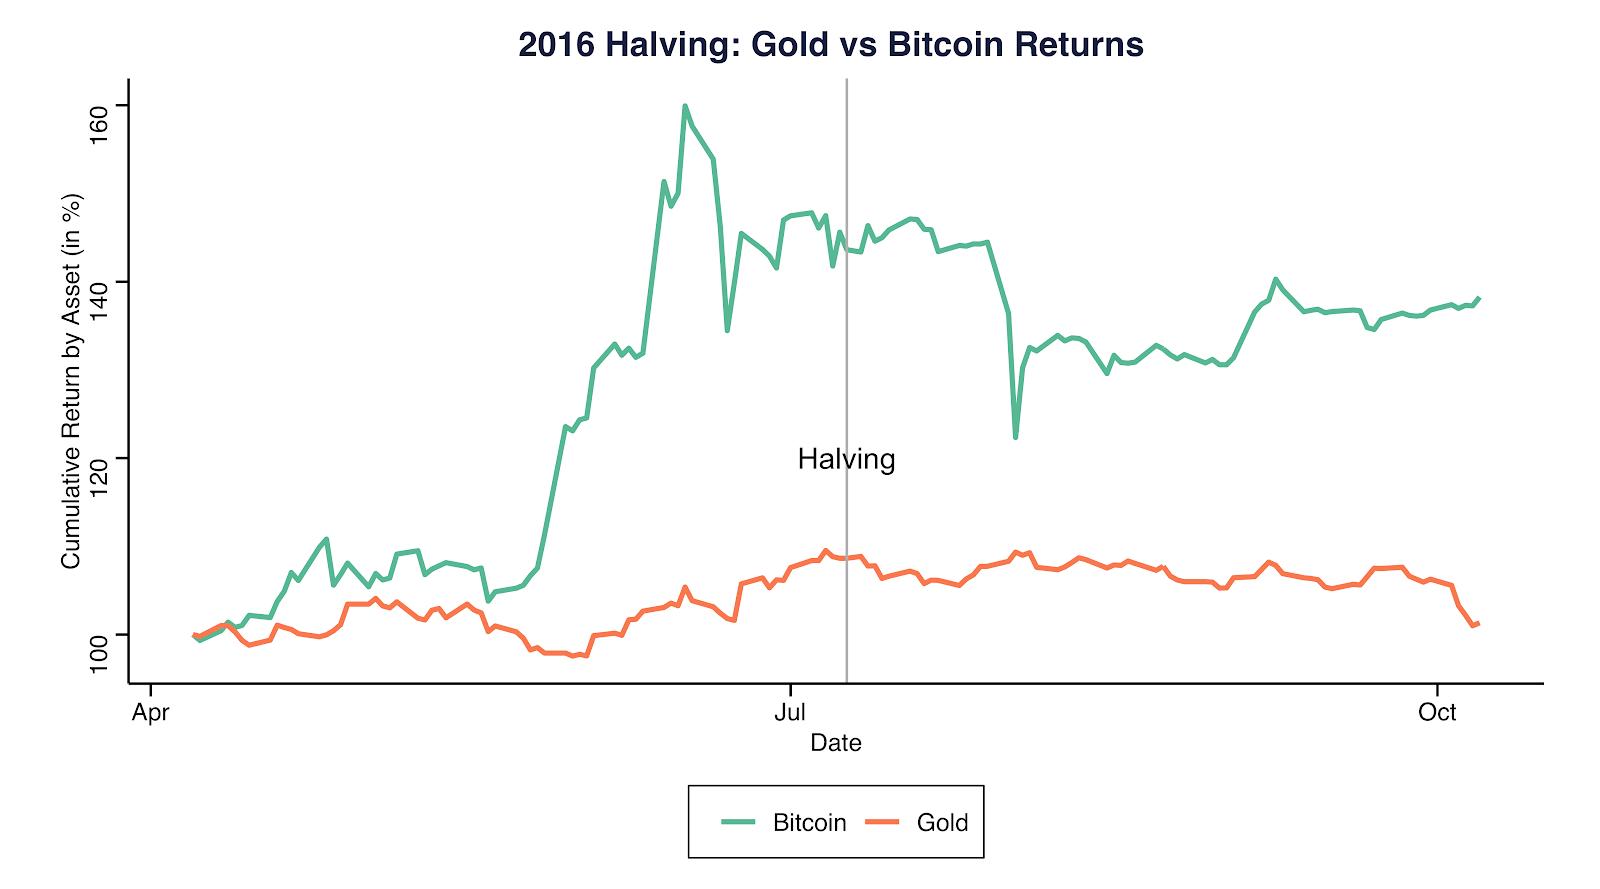 Halving de 2016: Retorno del oro vs. Bitcoin. Fuente: Coinmetrics.io y Gold.org